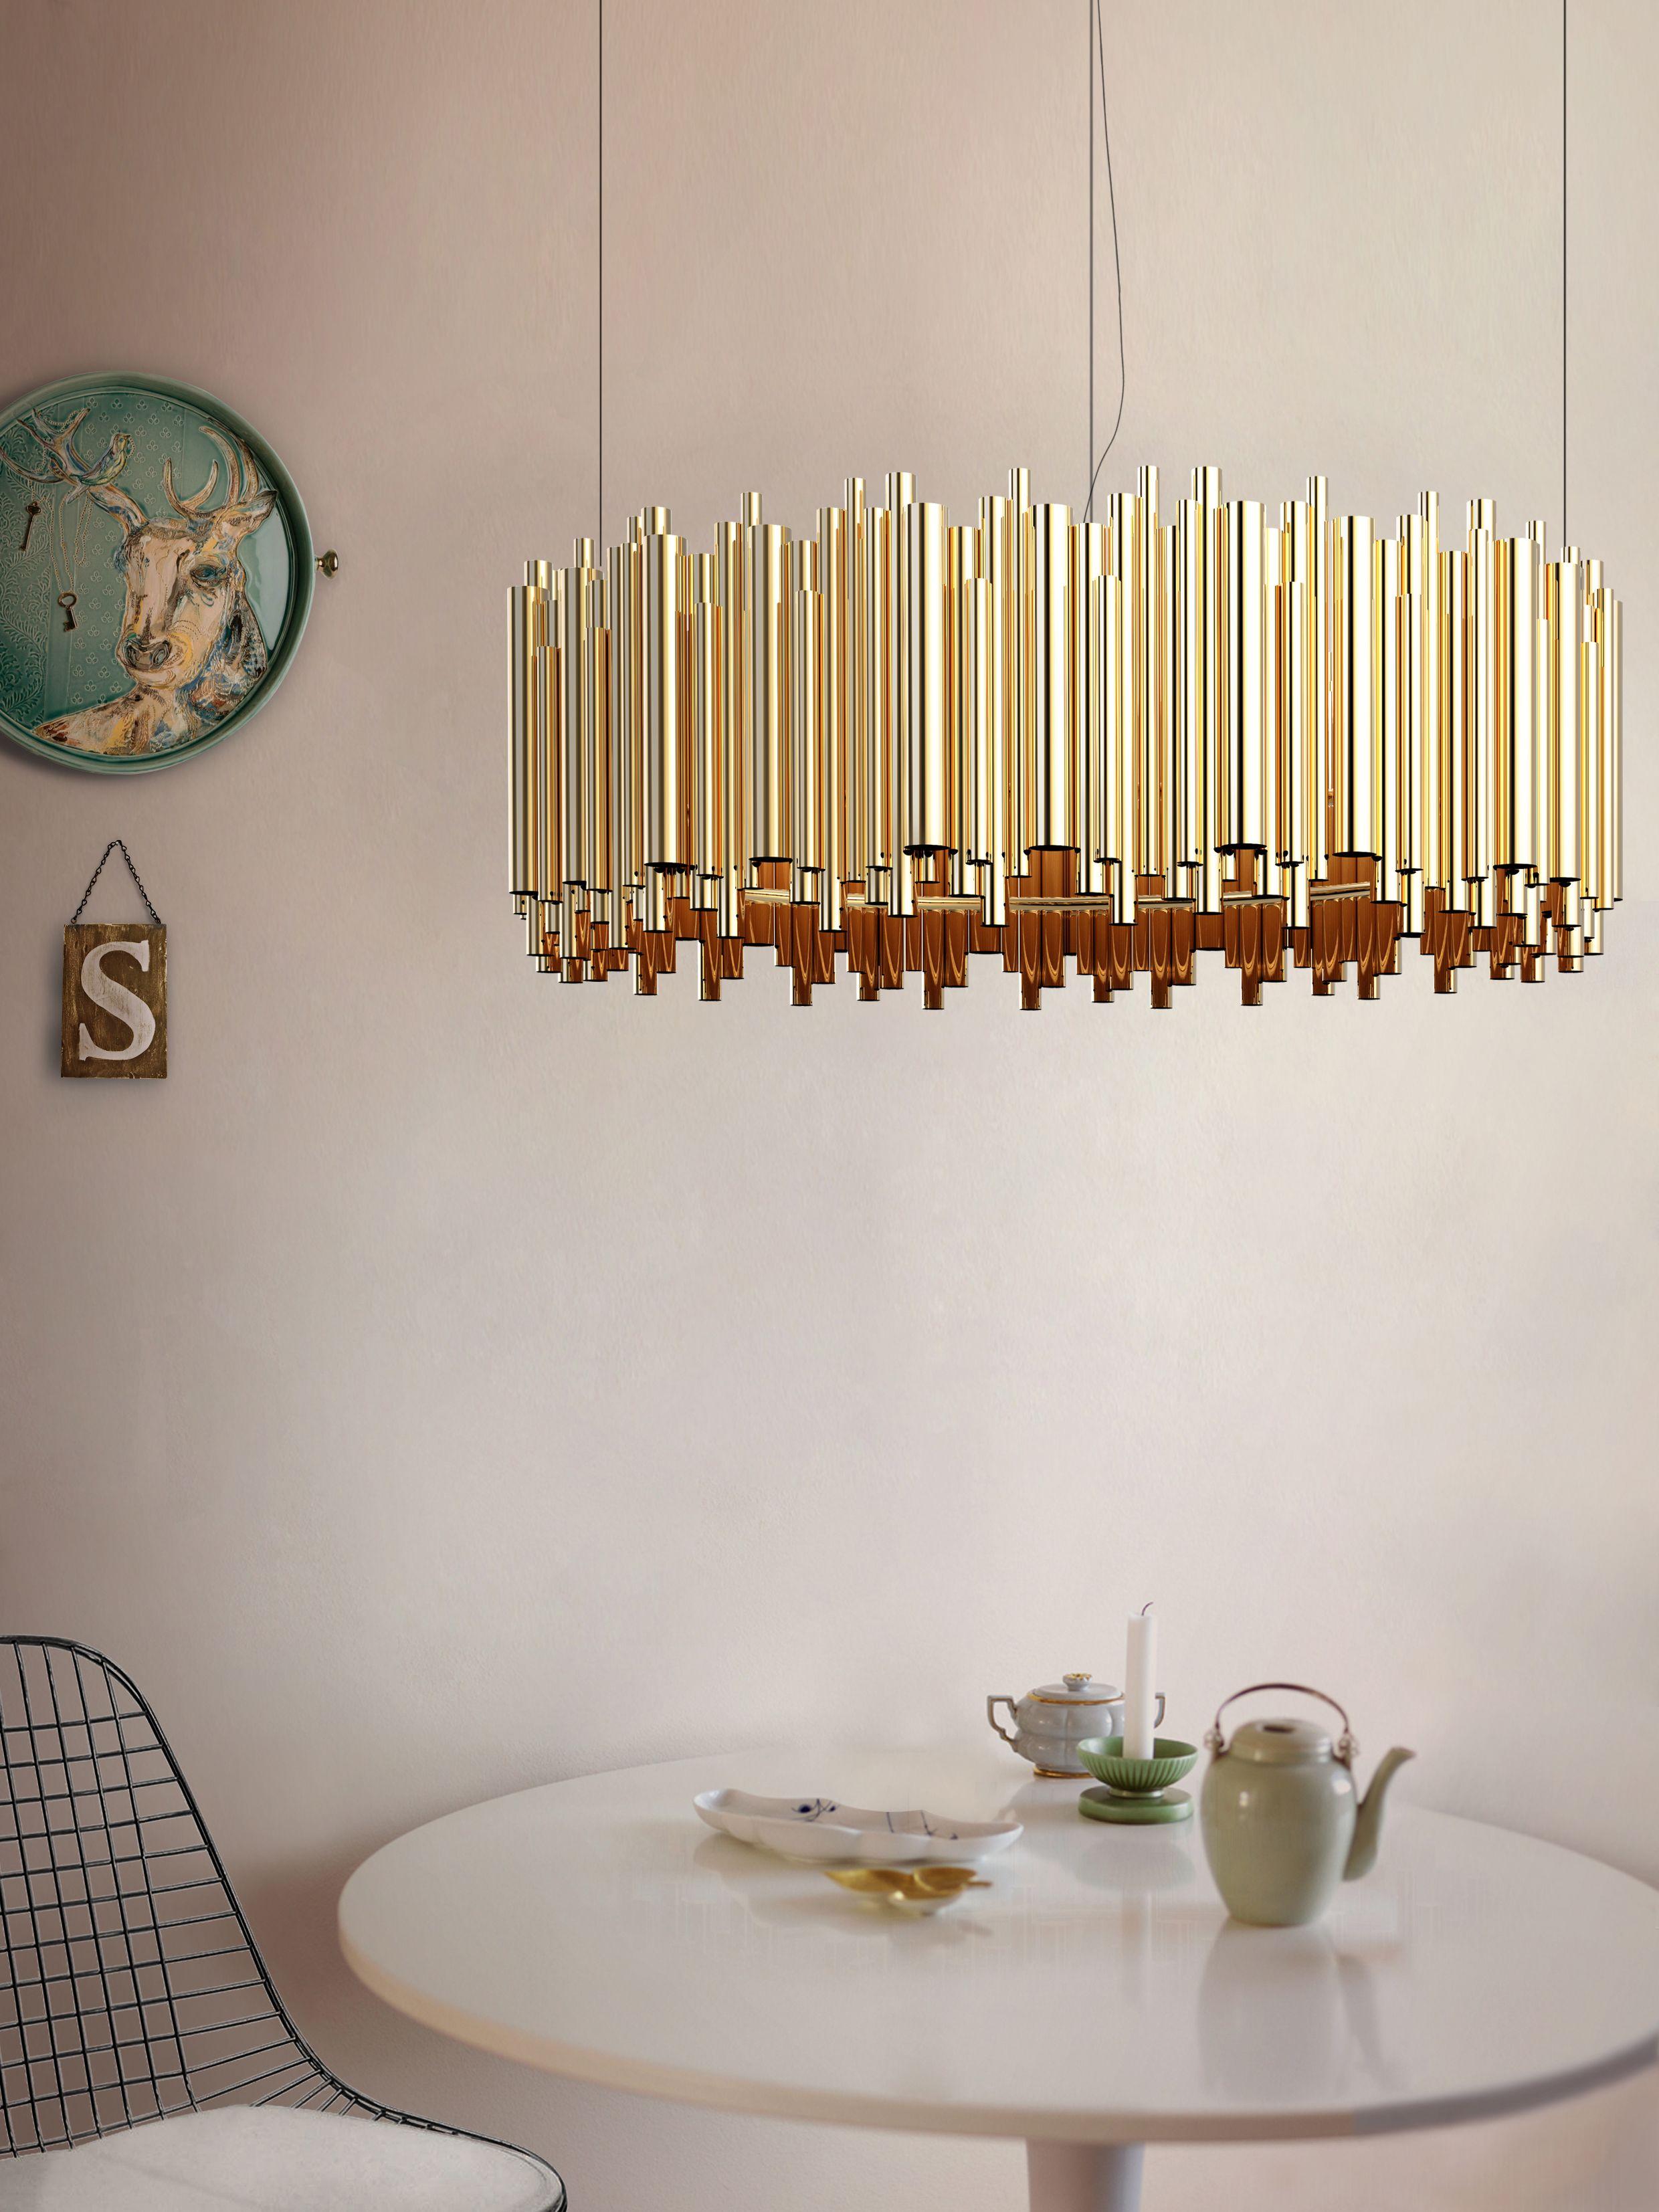 Dining Room Lighting Ideas For A Luxury Interior Design Feel Inspired Www Luxxu Net Lighting Interio Delightful Lighting Unique Hanging Lamp Unique Lamps